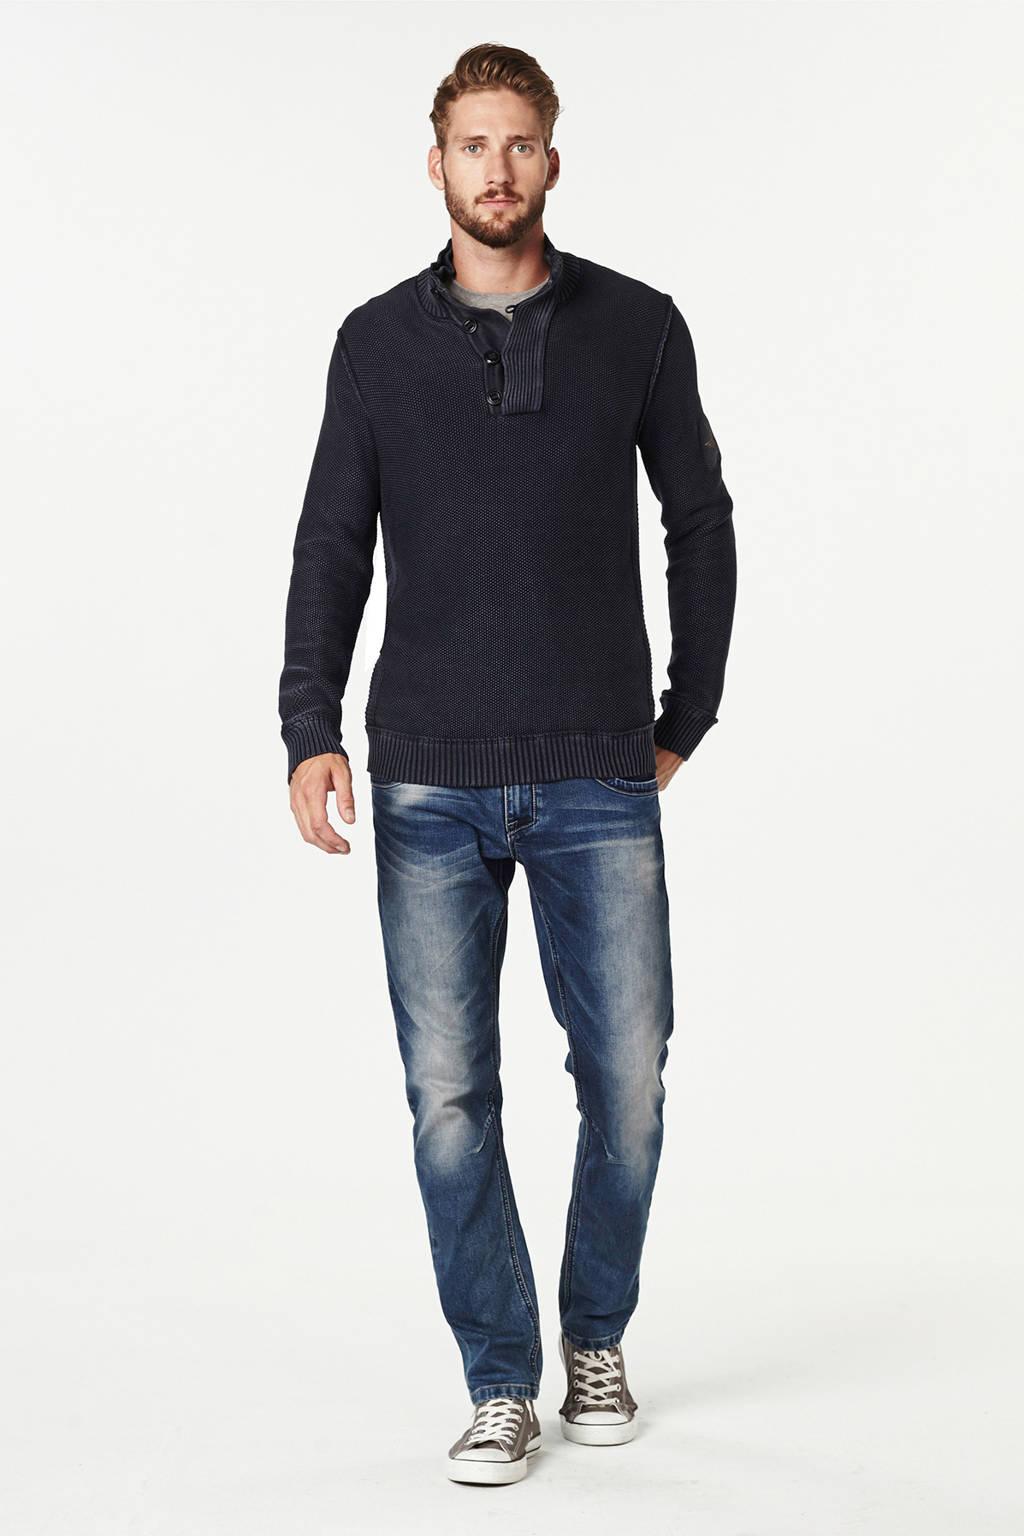 Cars regular fit jeans Blackstar albany wash, Albany wash